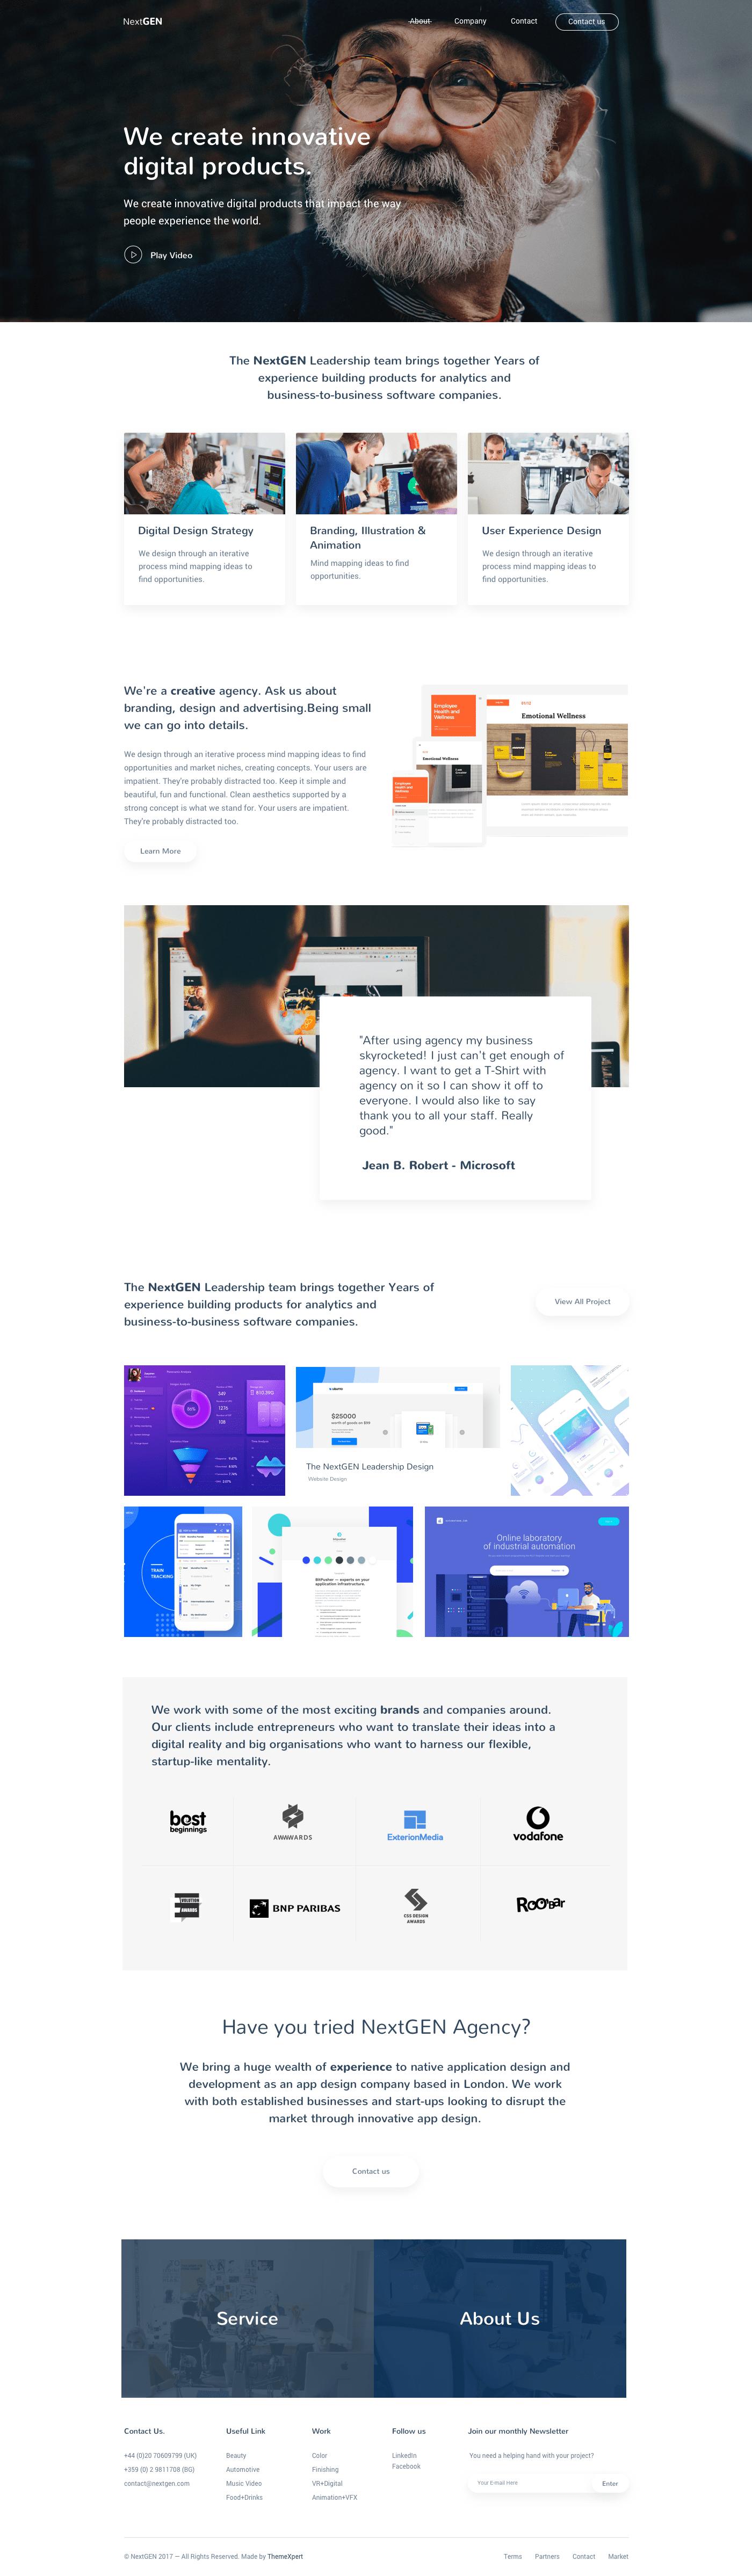 NextGEN - Free Sketch Template for Agency Website 1